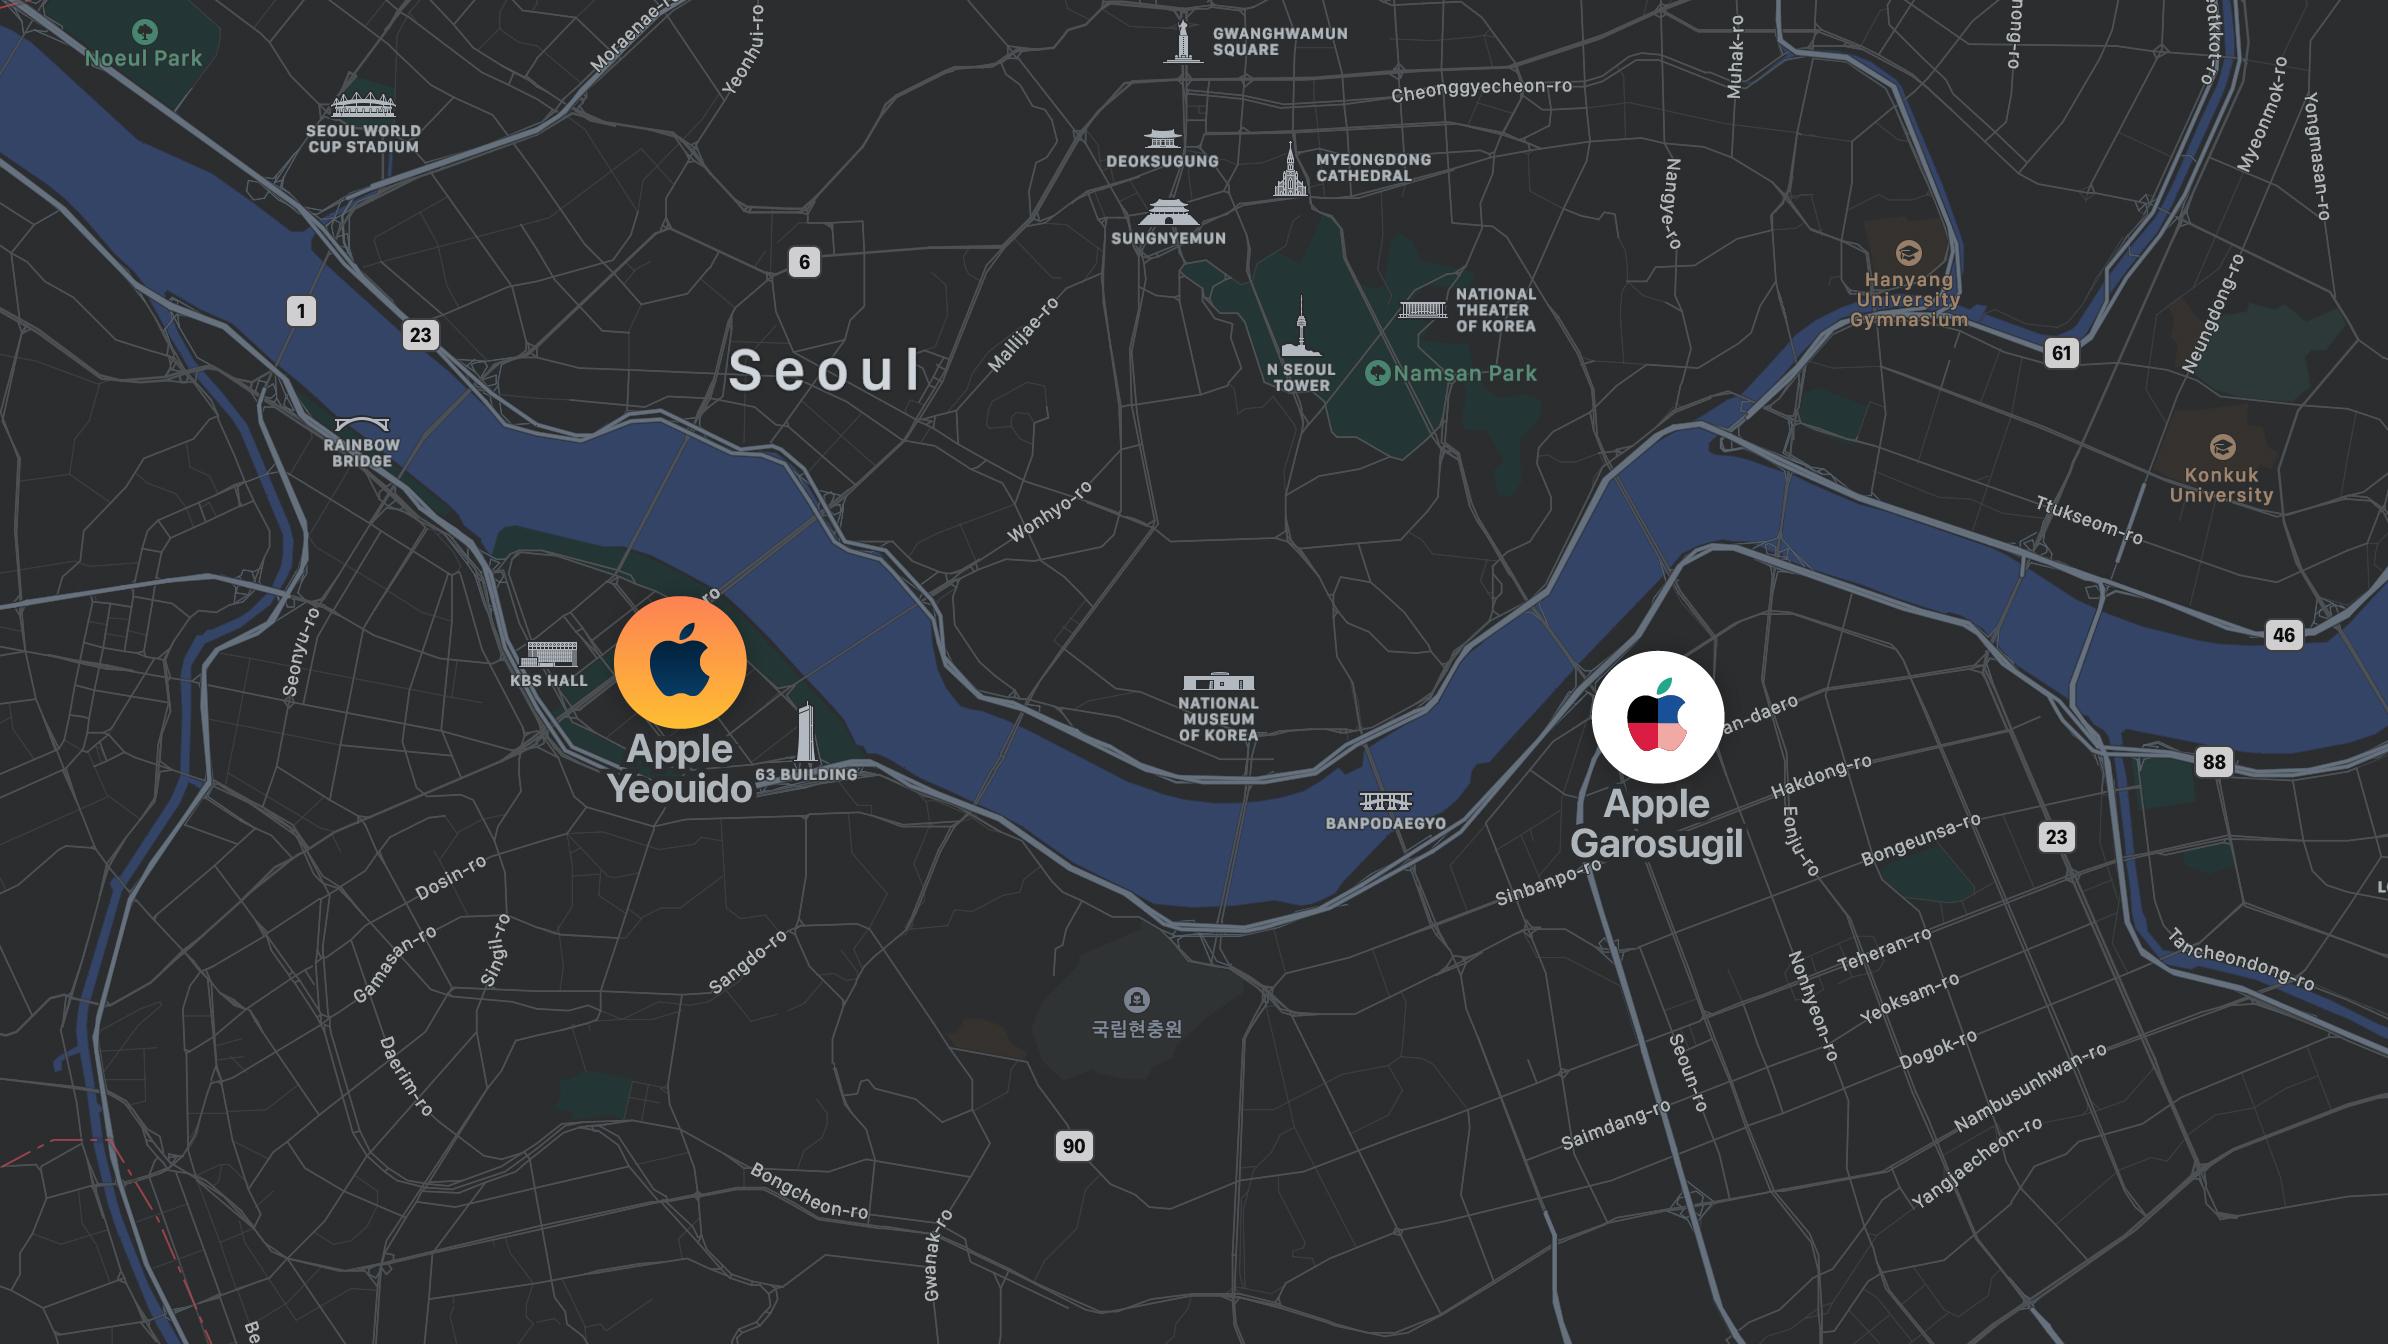 Apple Yeouido location